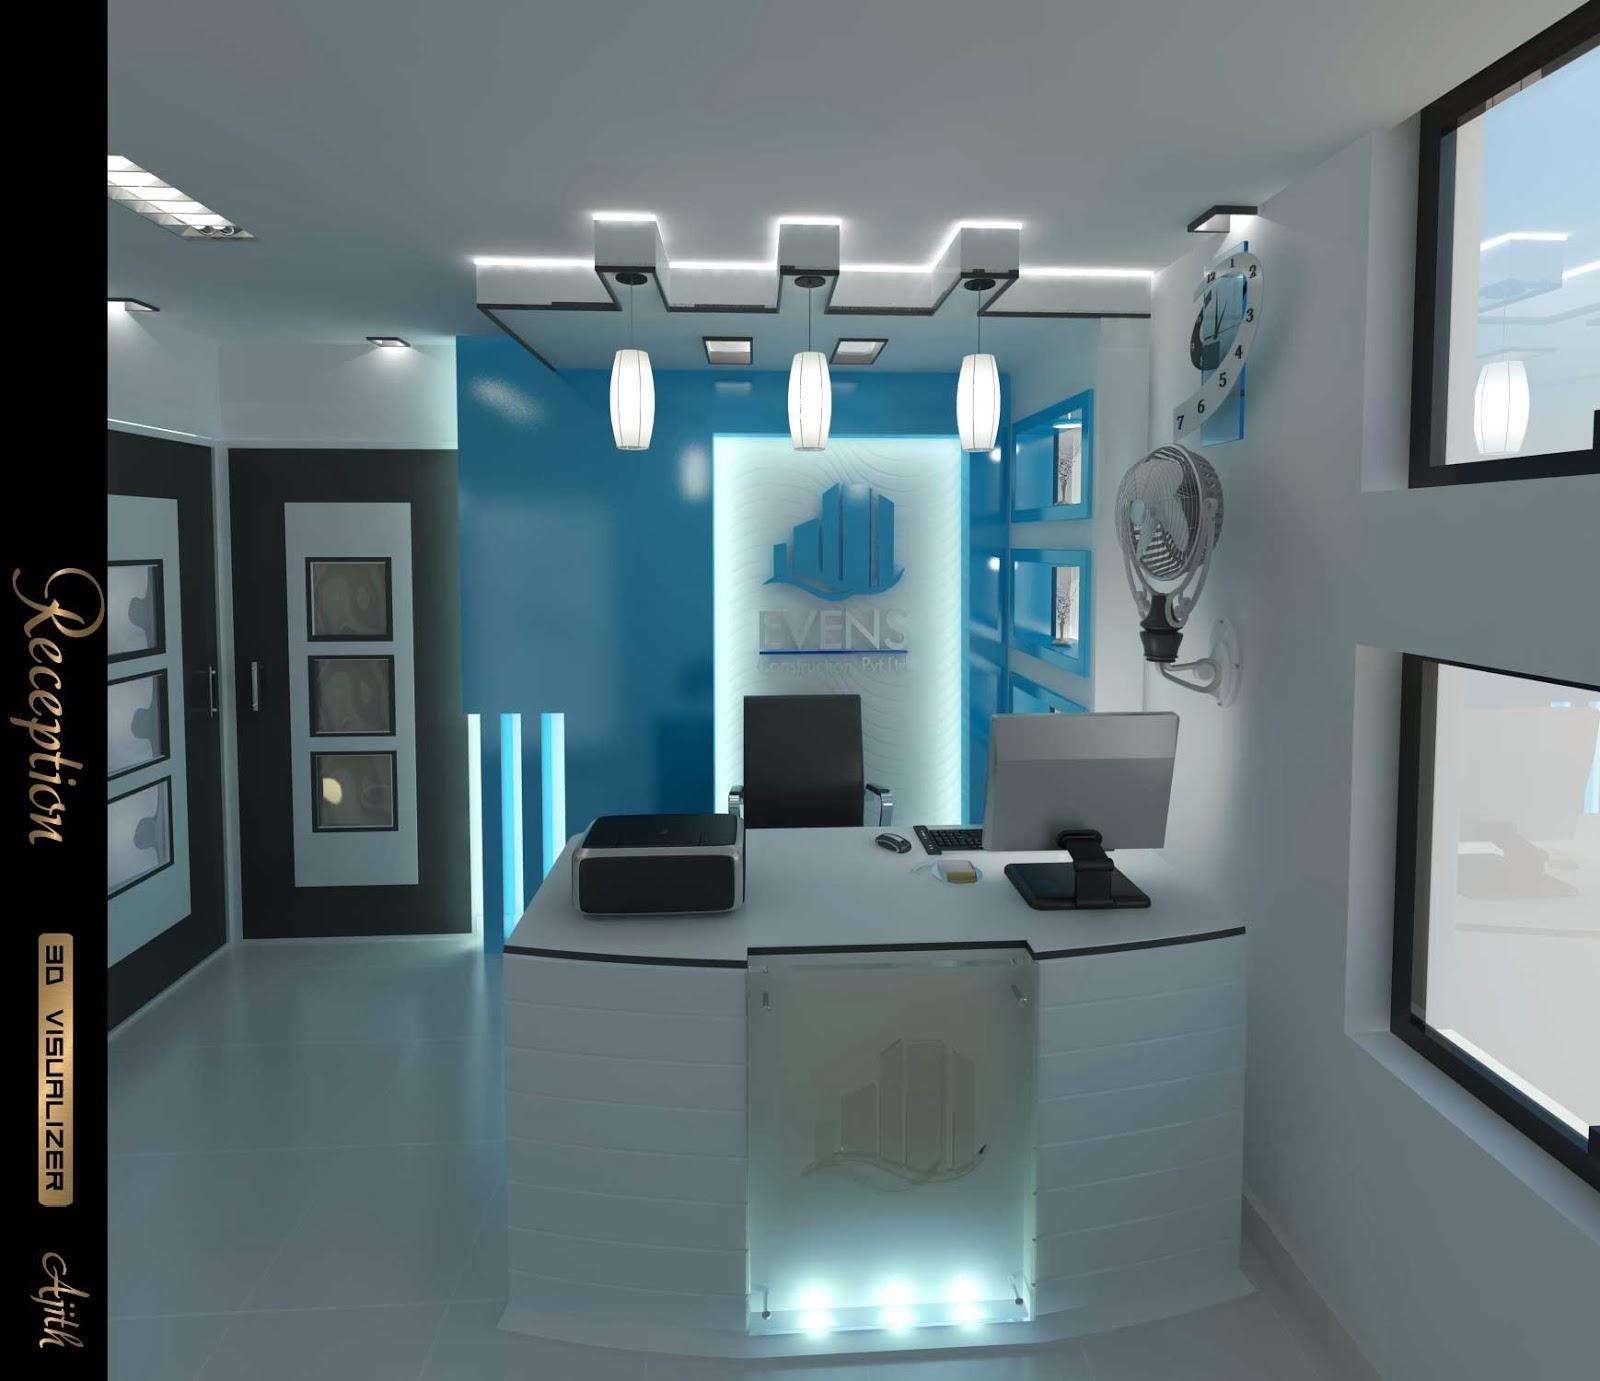 Evens Construction Pvt Ltd Office Design